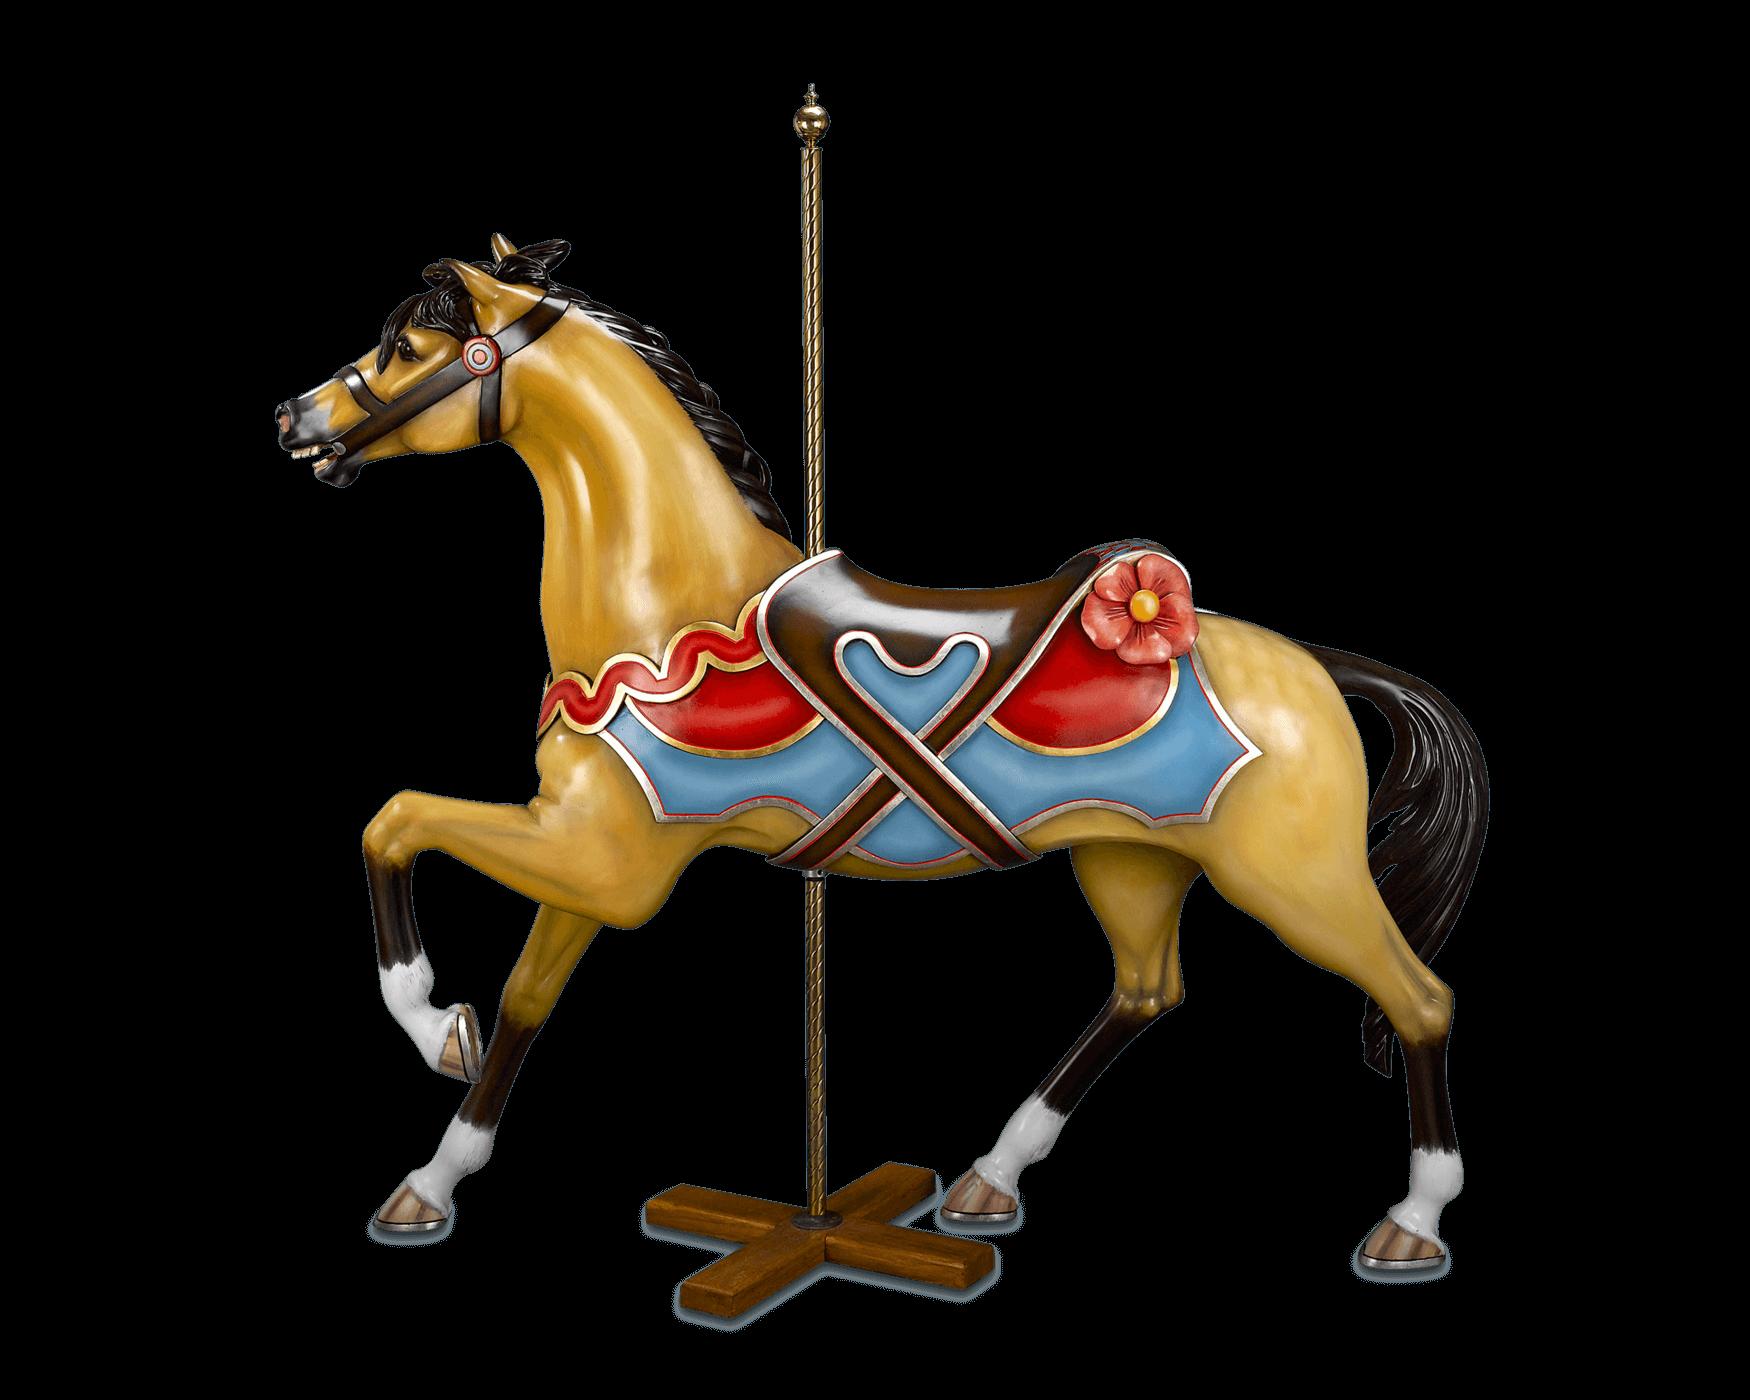 Carousel PNG Image